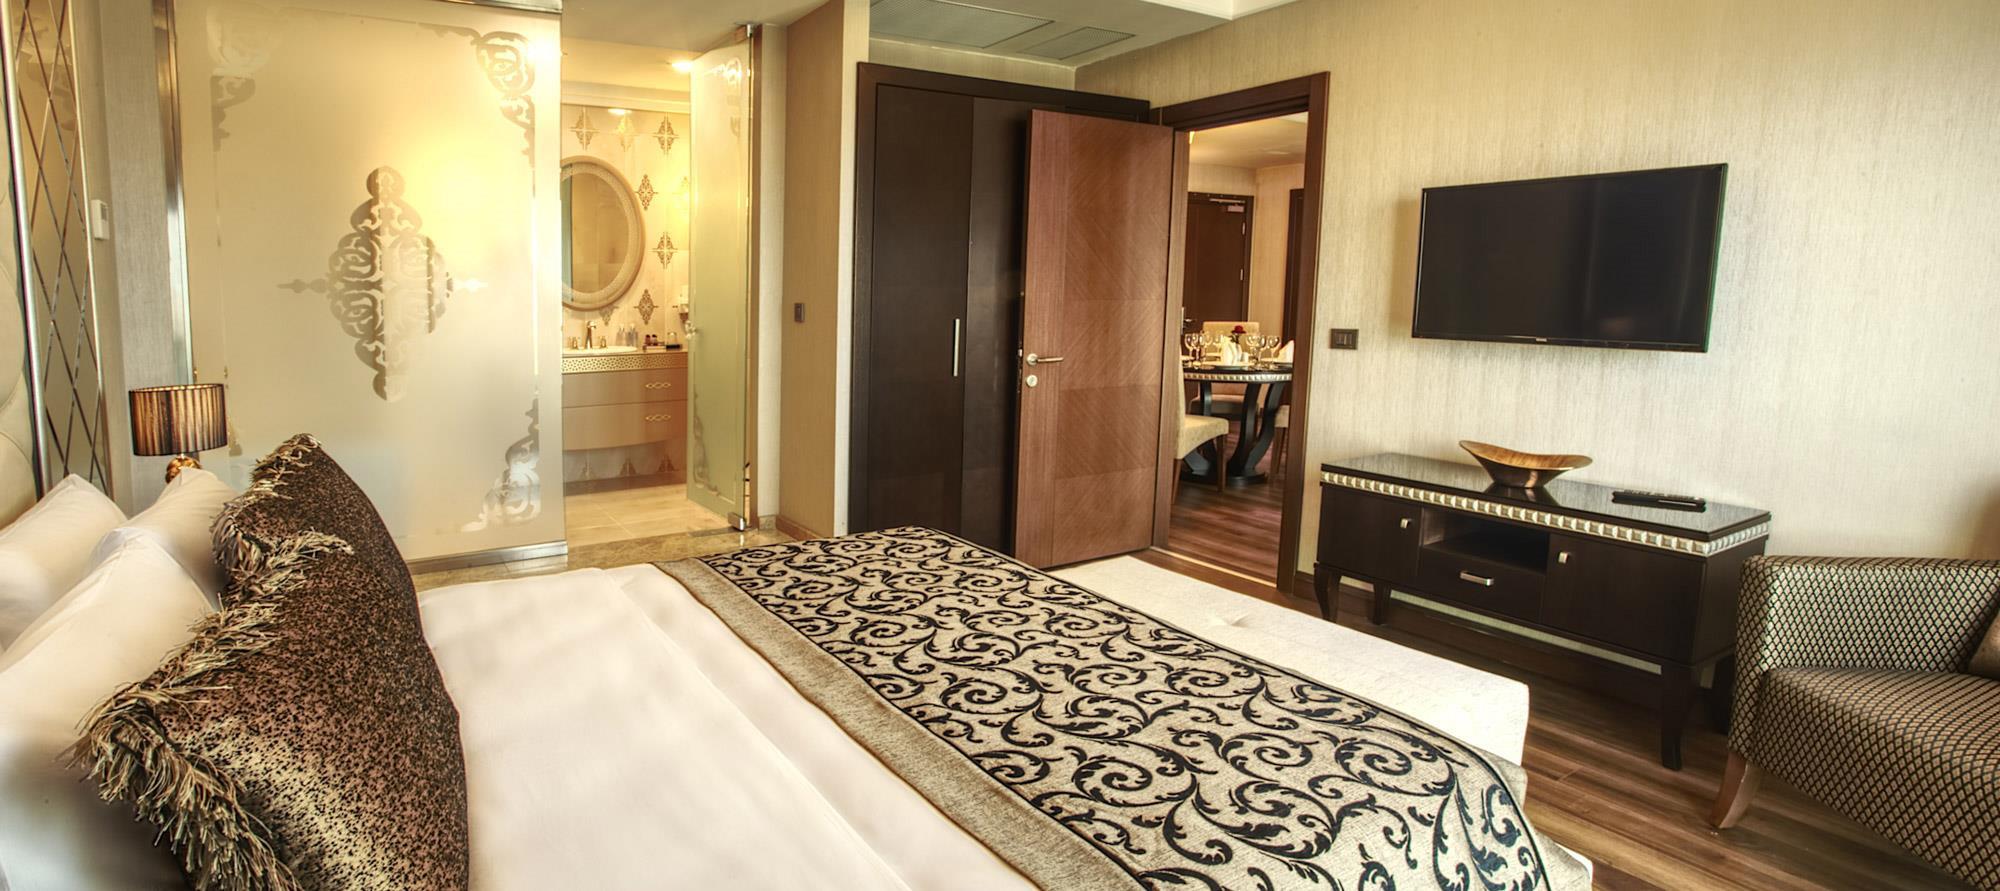 Grand Makel Hotel Topkapi254614